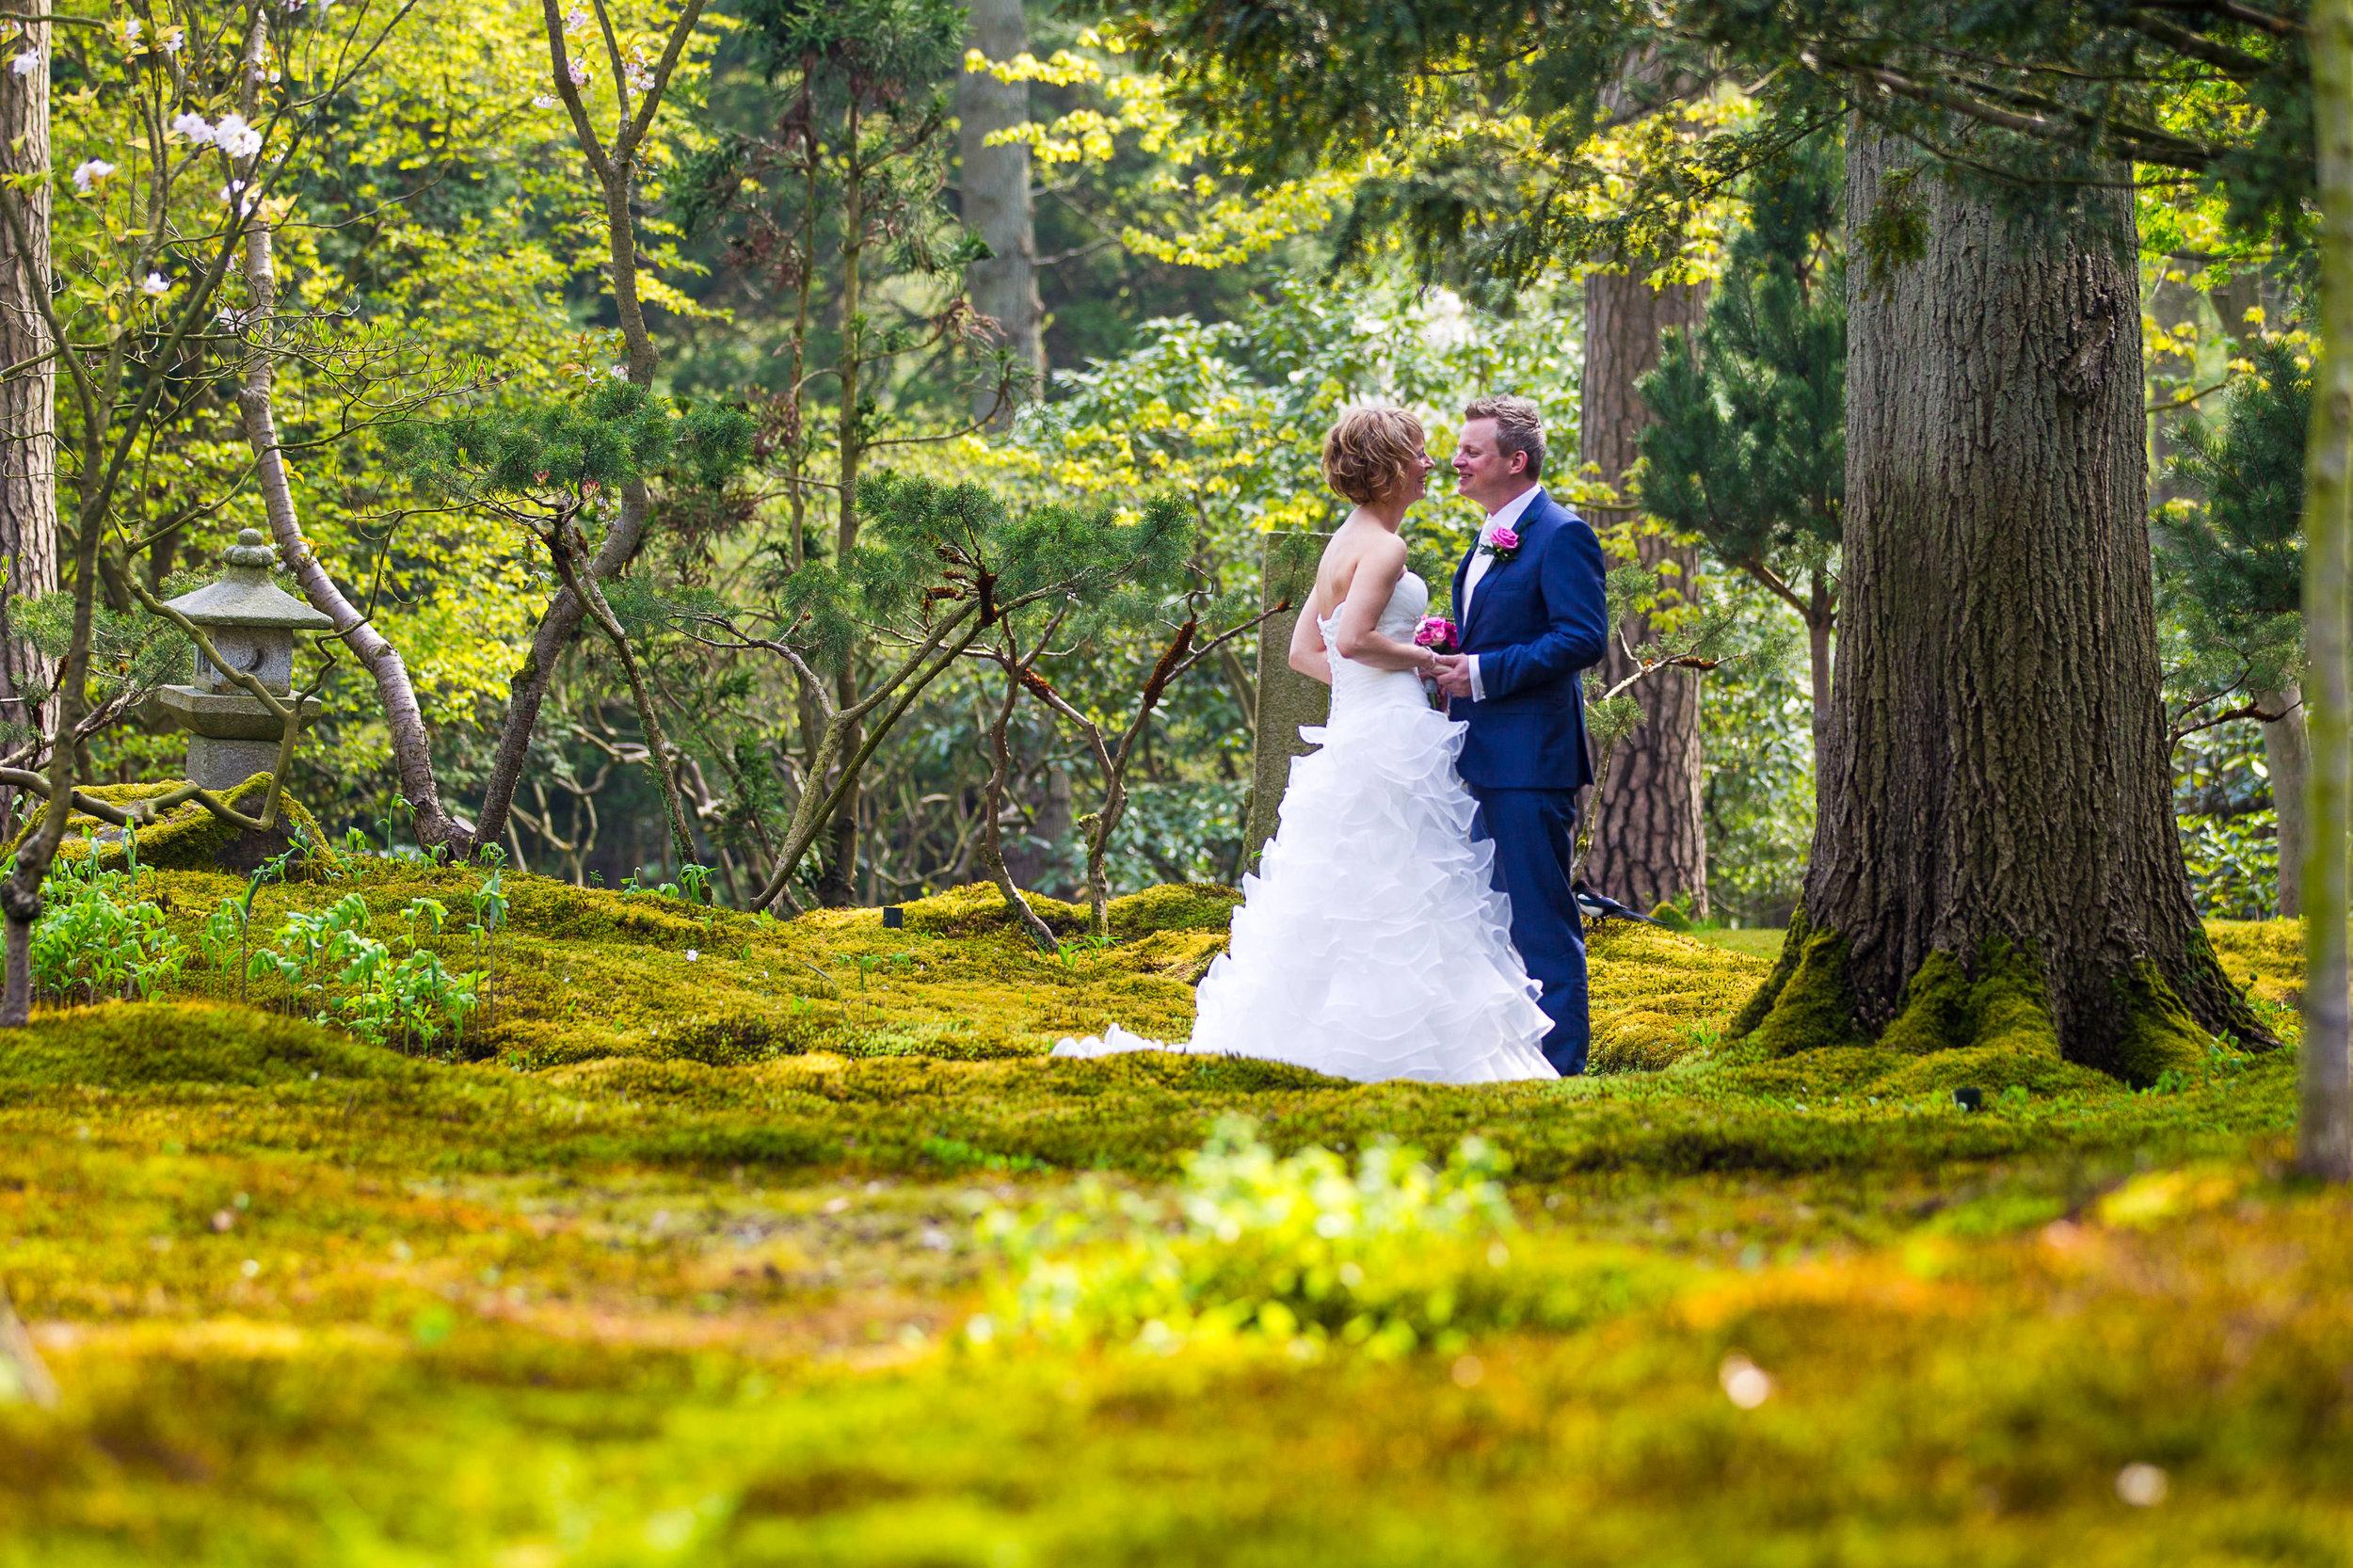 trouwshoot-bruidsfotografie-trouwfoto-feestfotografie-marcel en desiree-278.jpg